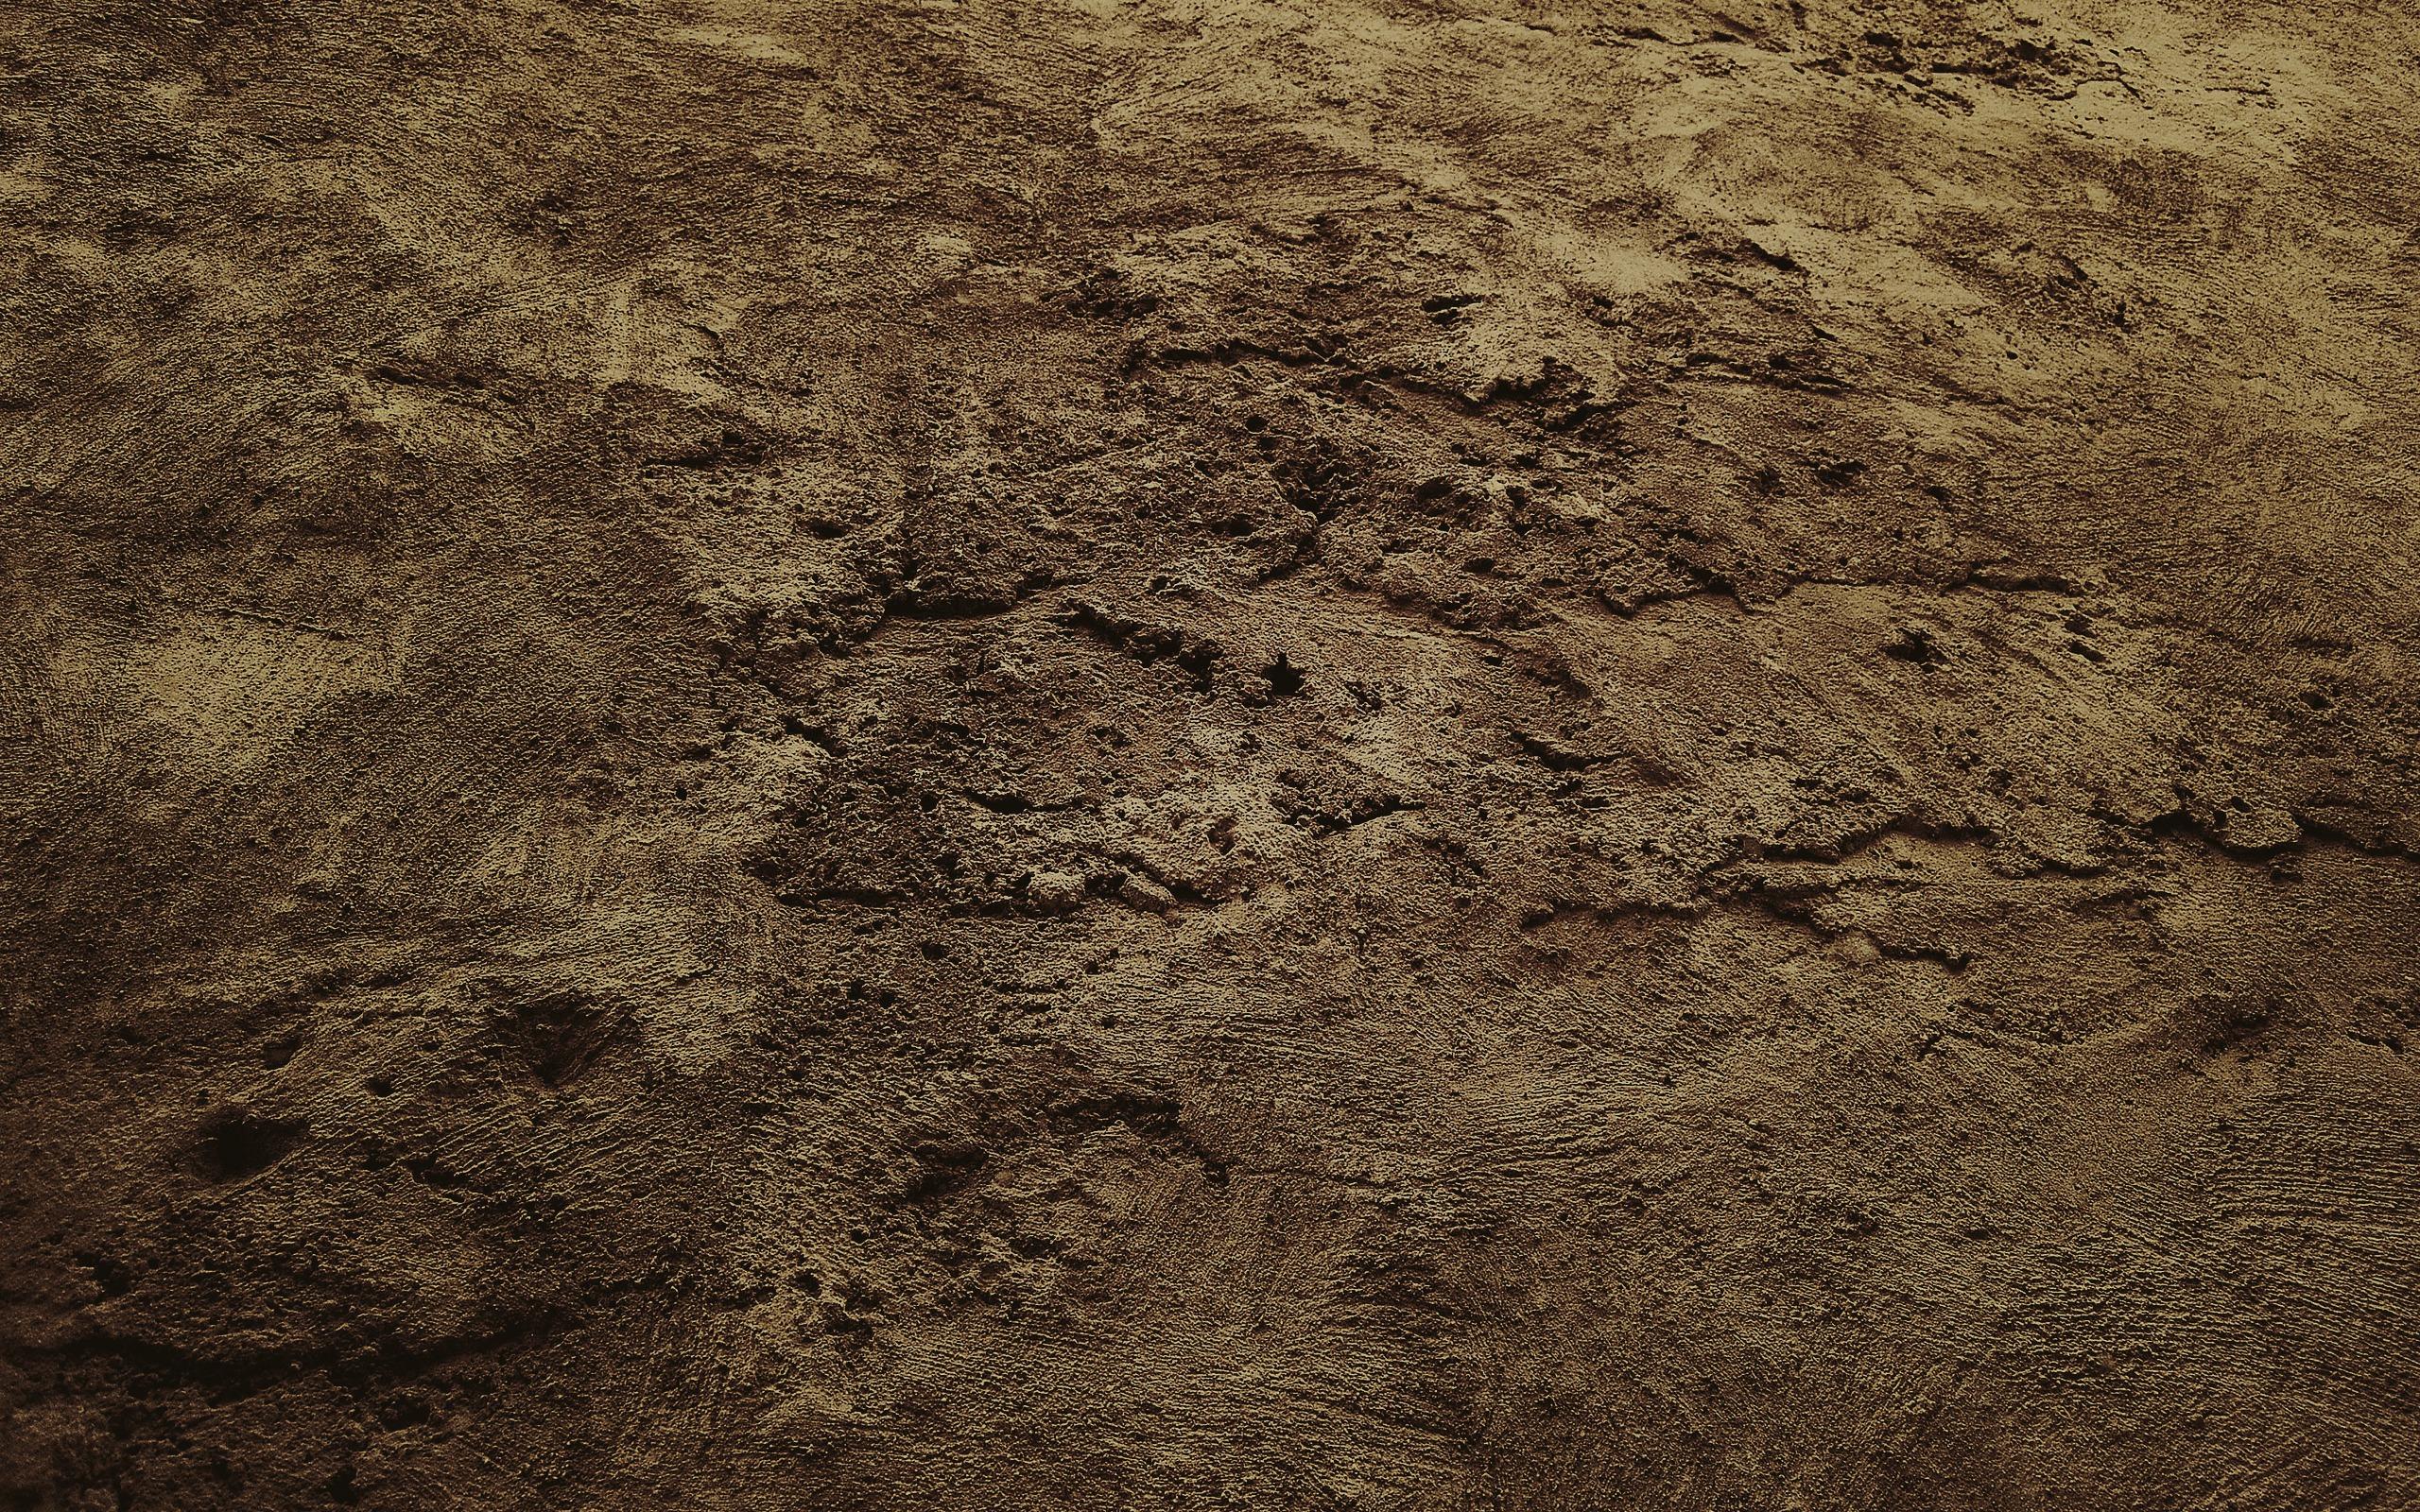 forwallpapercomwallpapertexture soil land sand clay mud 223601html 2560x1600